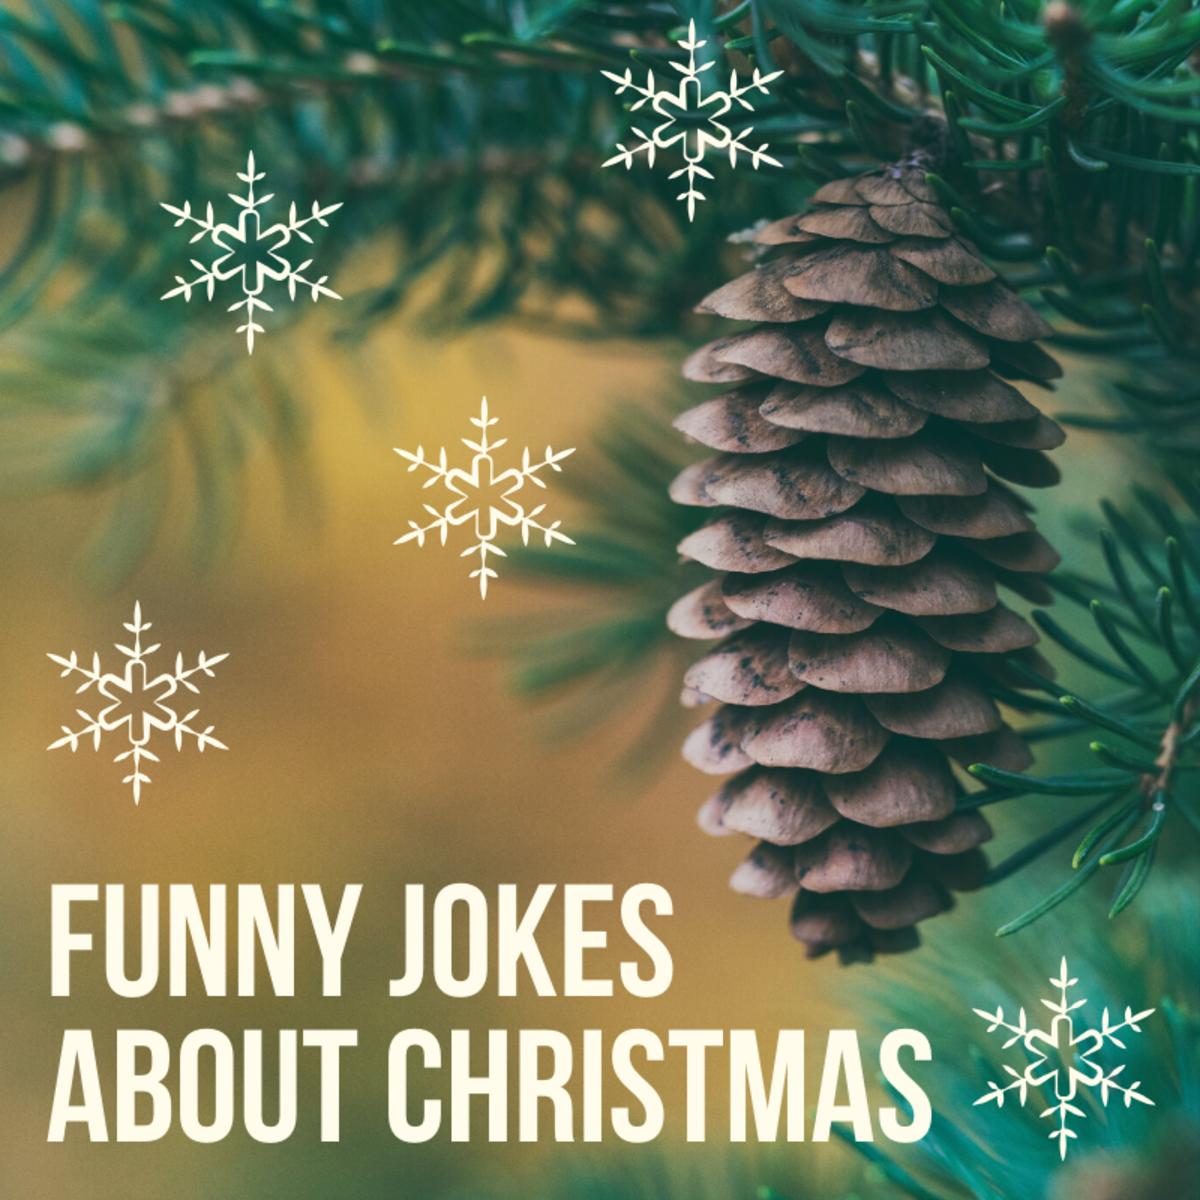 The Funniest Christmas Jokes